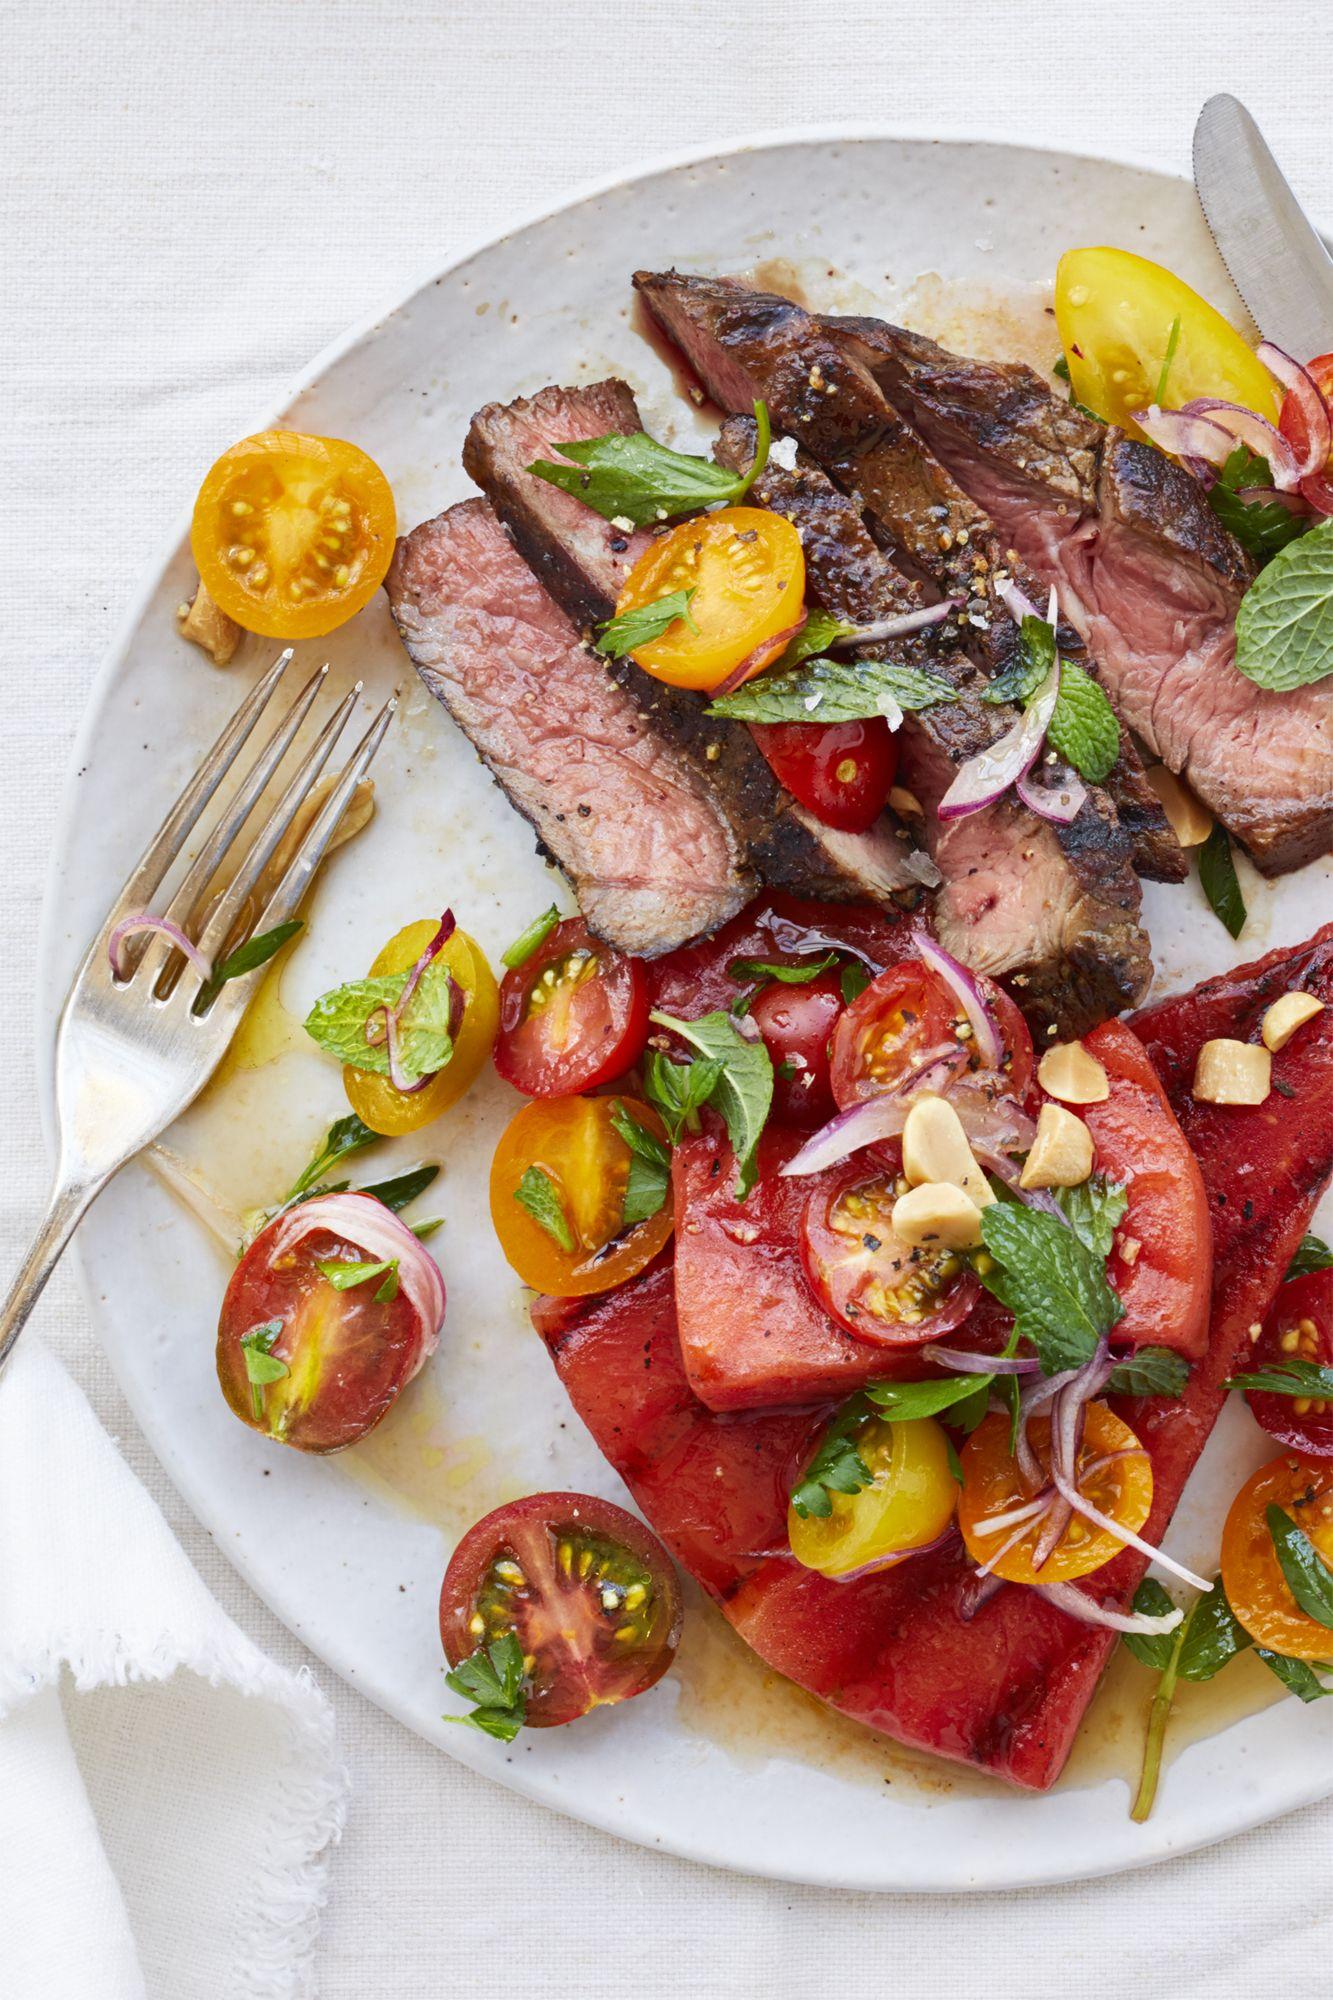 Grilled Watermelon Salad With Steak